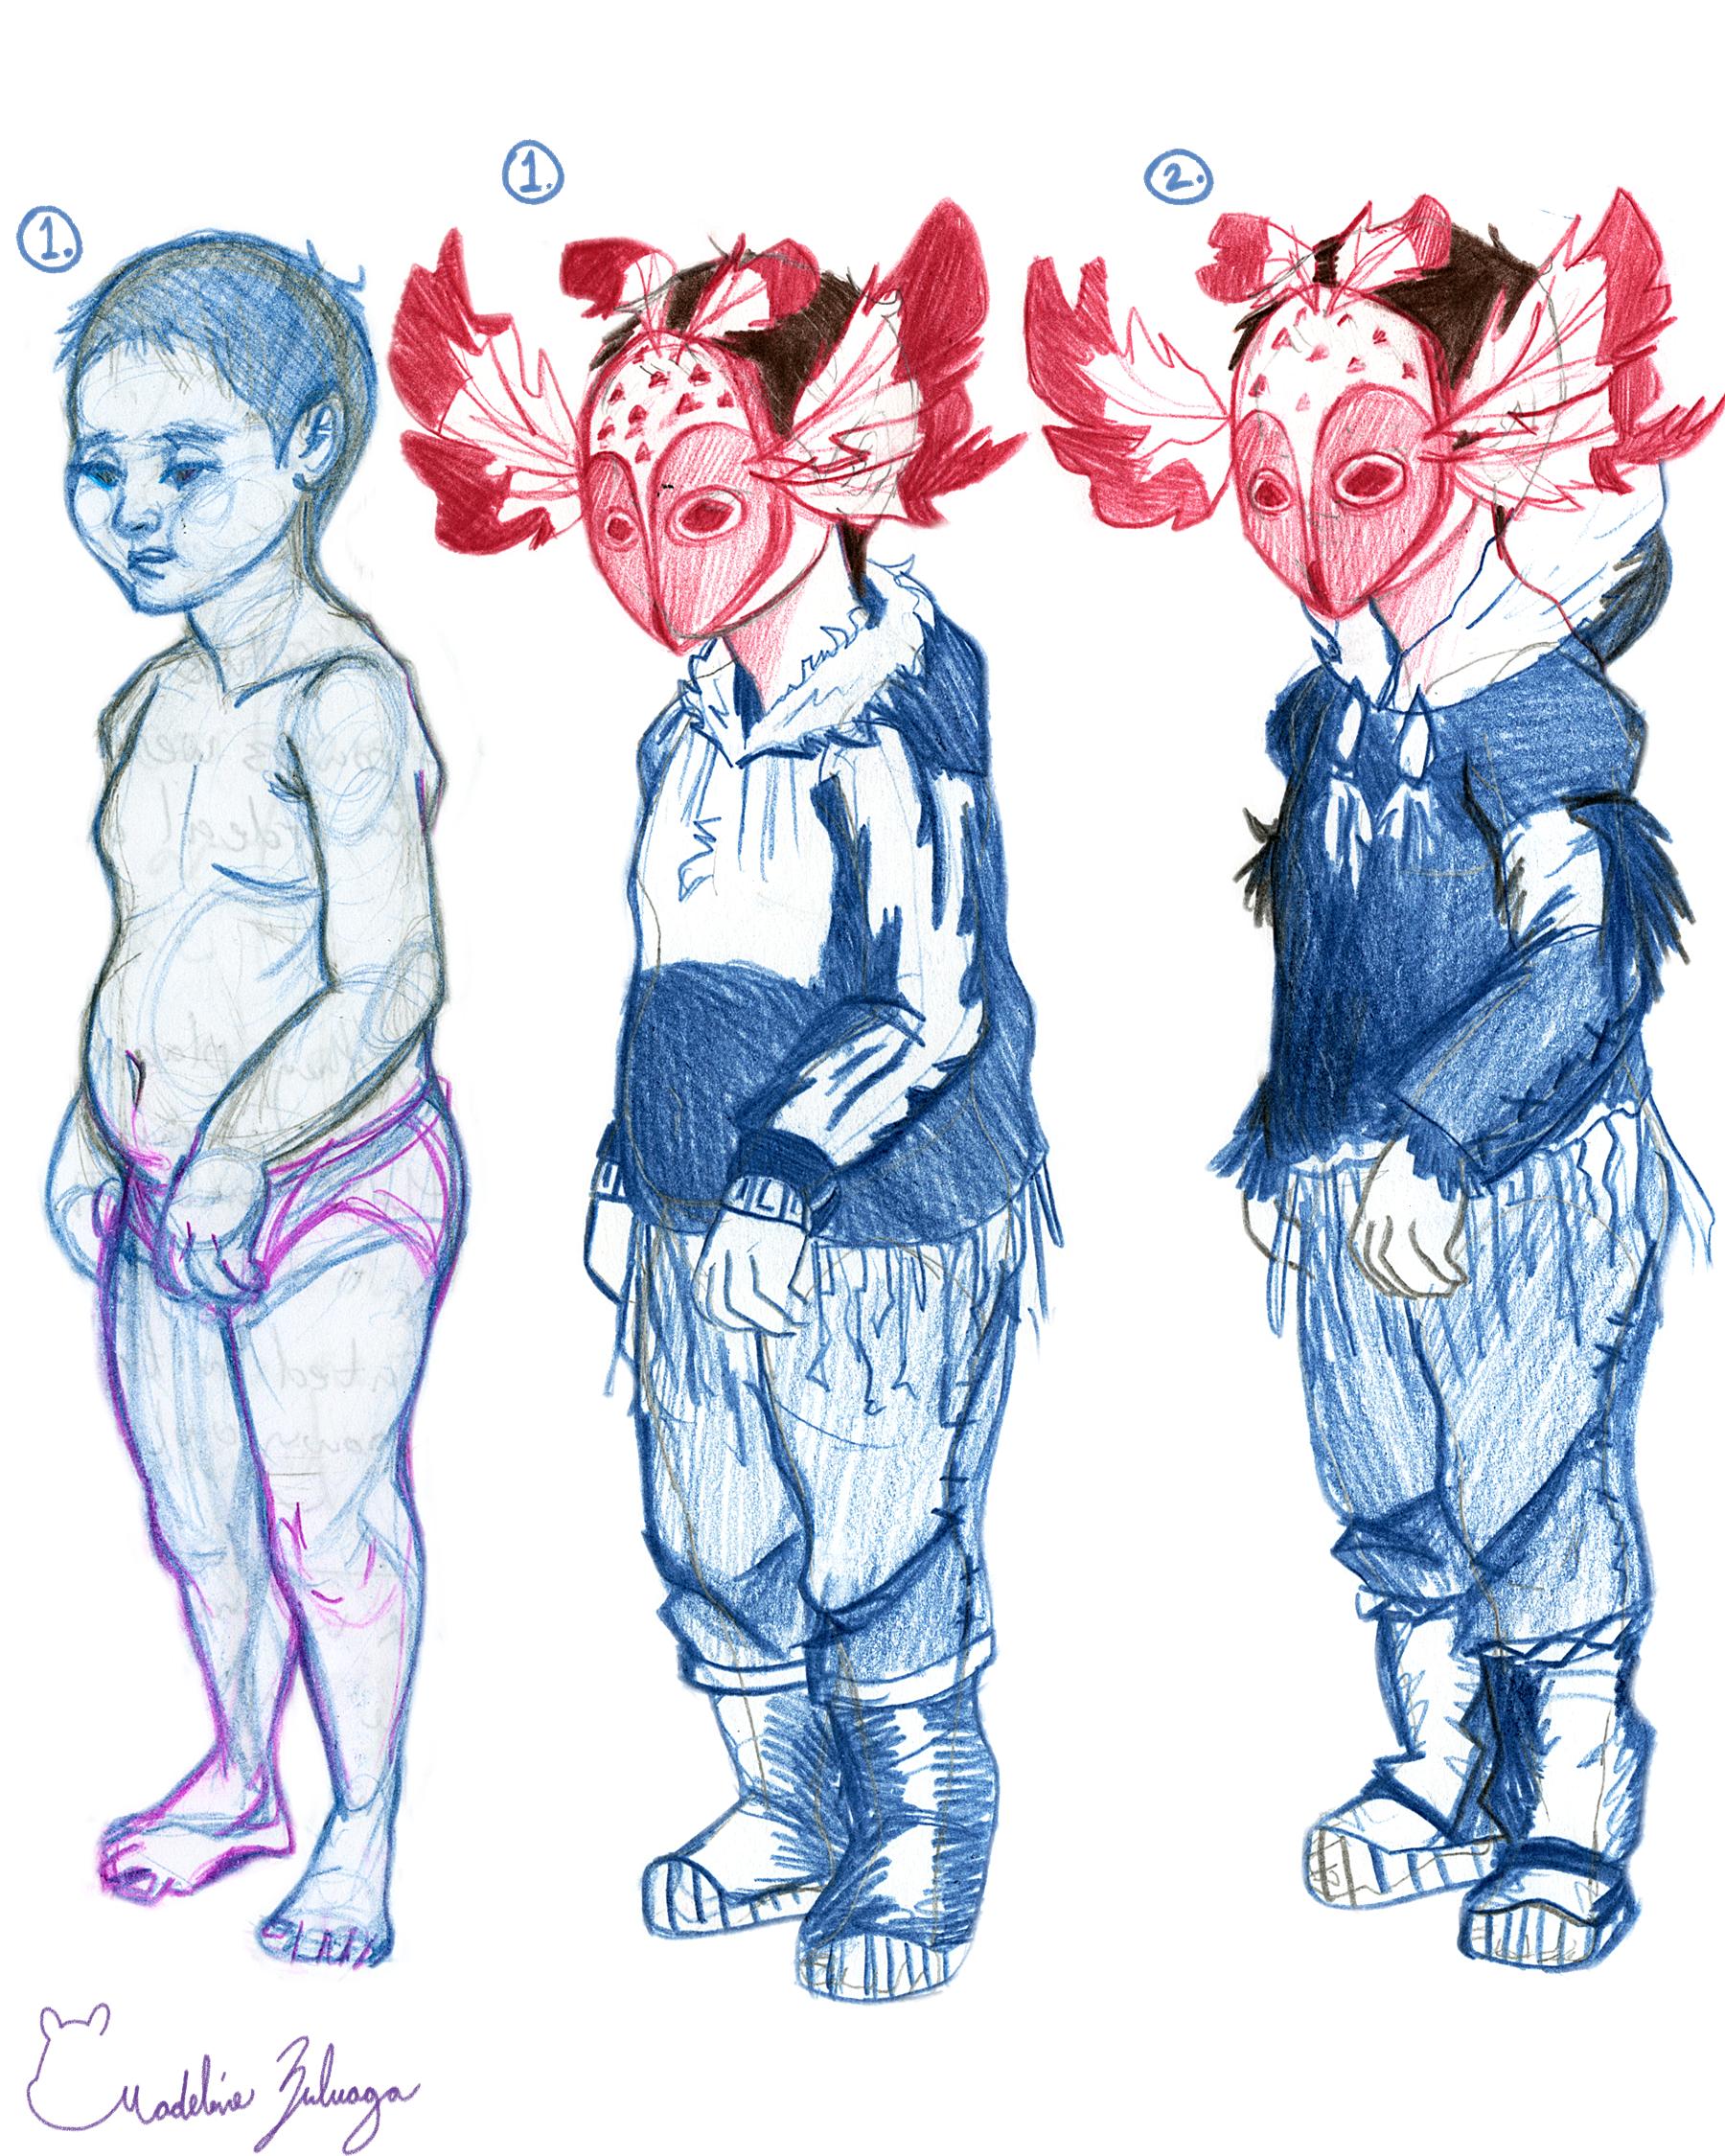 Yup'ik-boy-character-designs-madeline-zuluaga.png